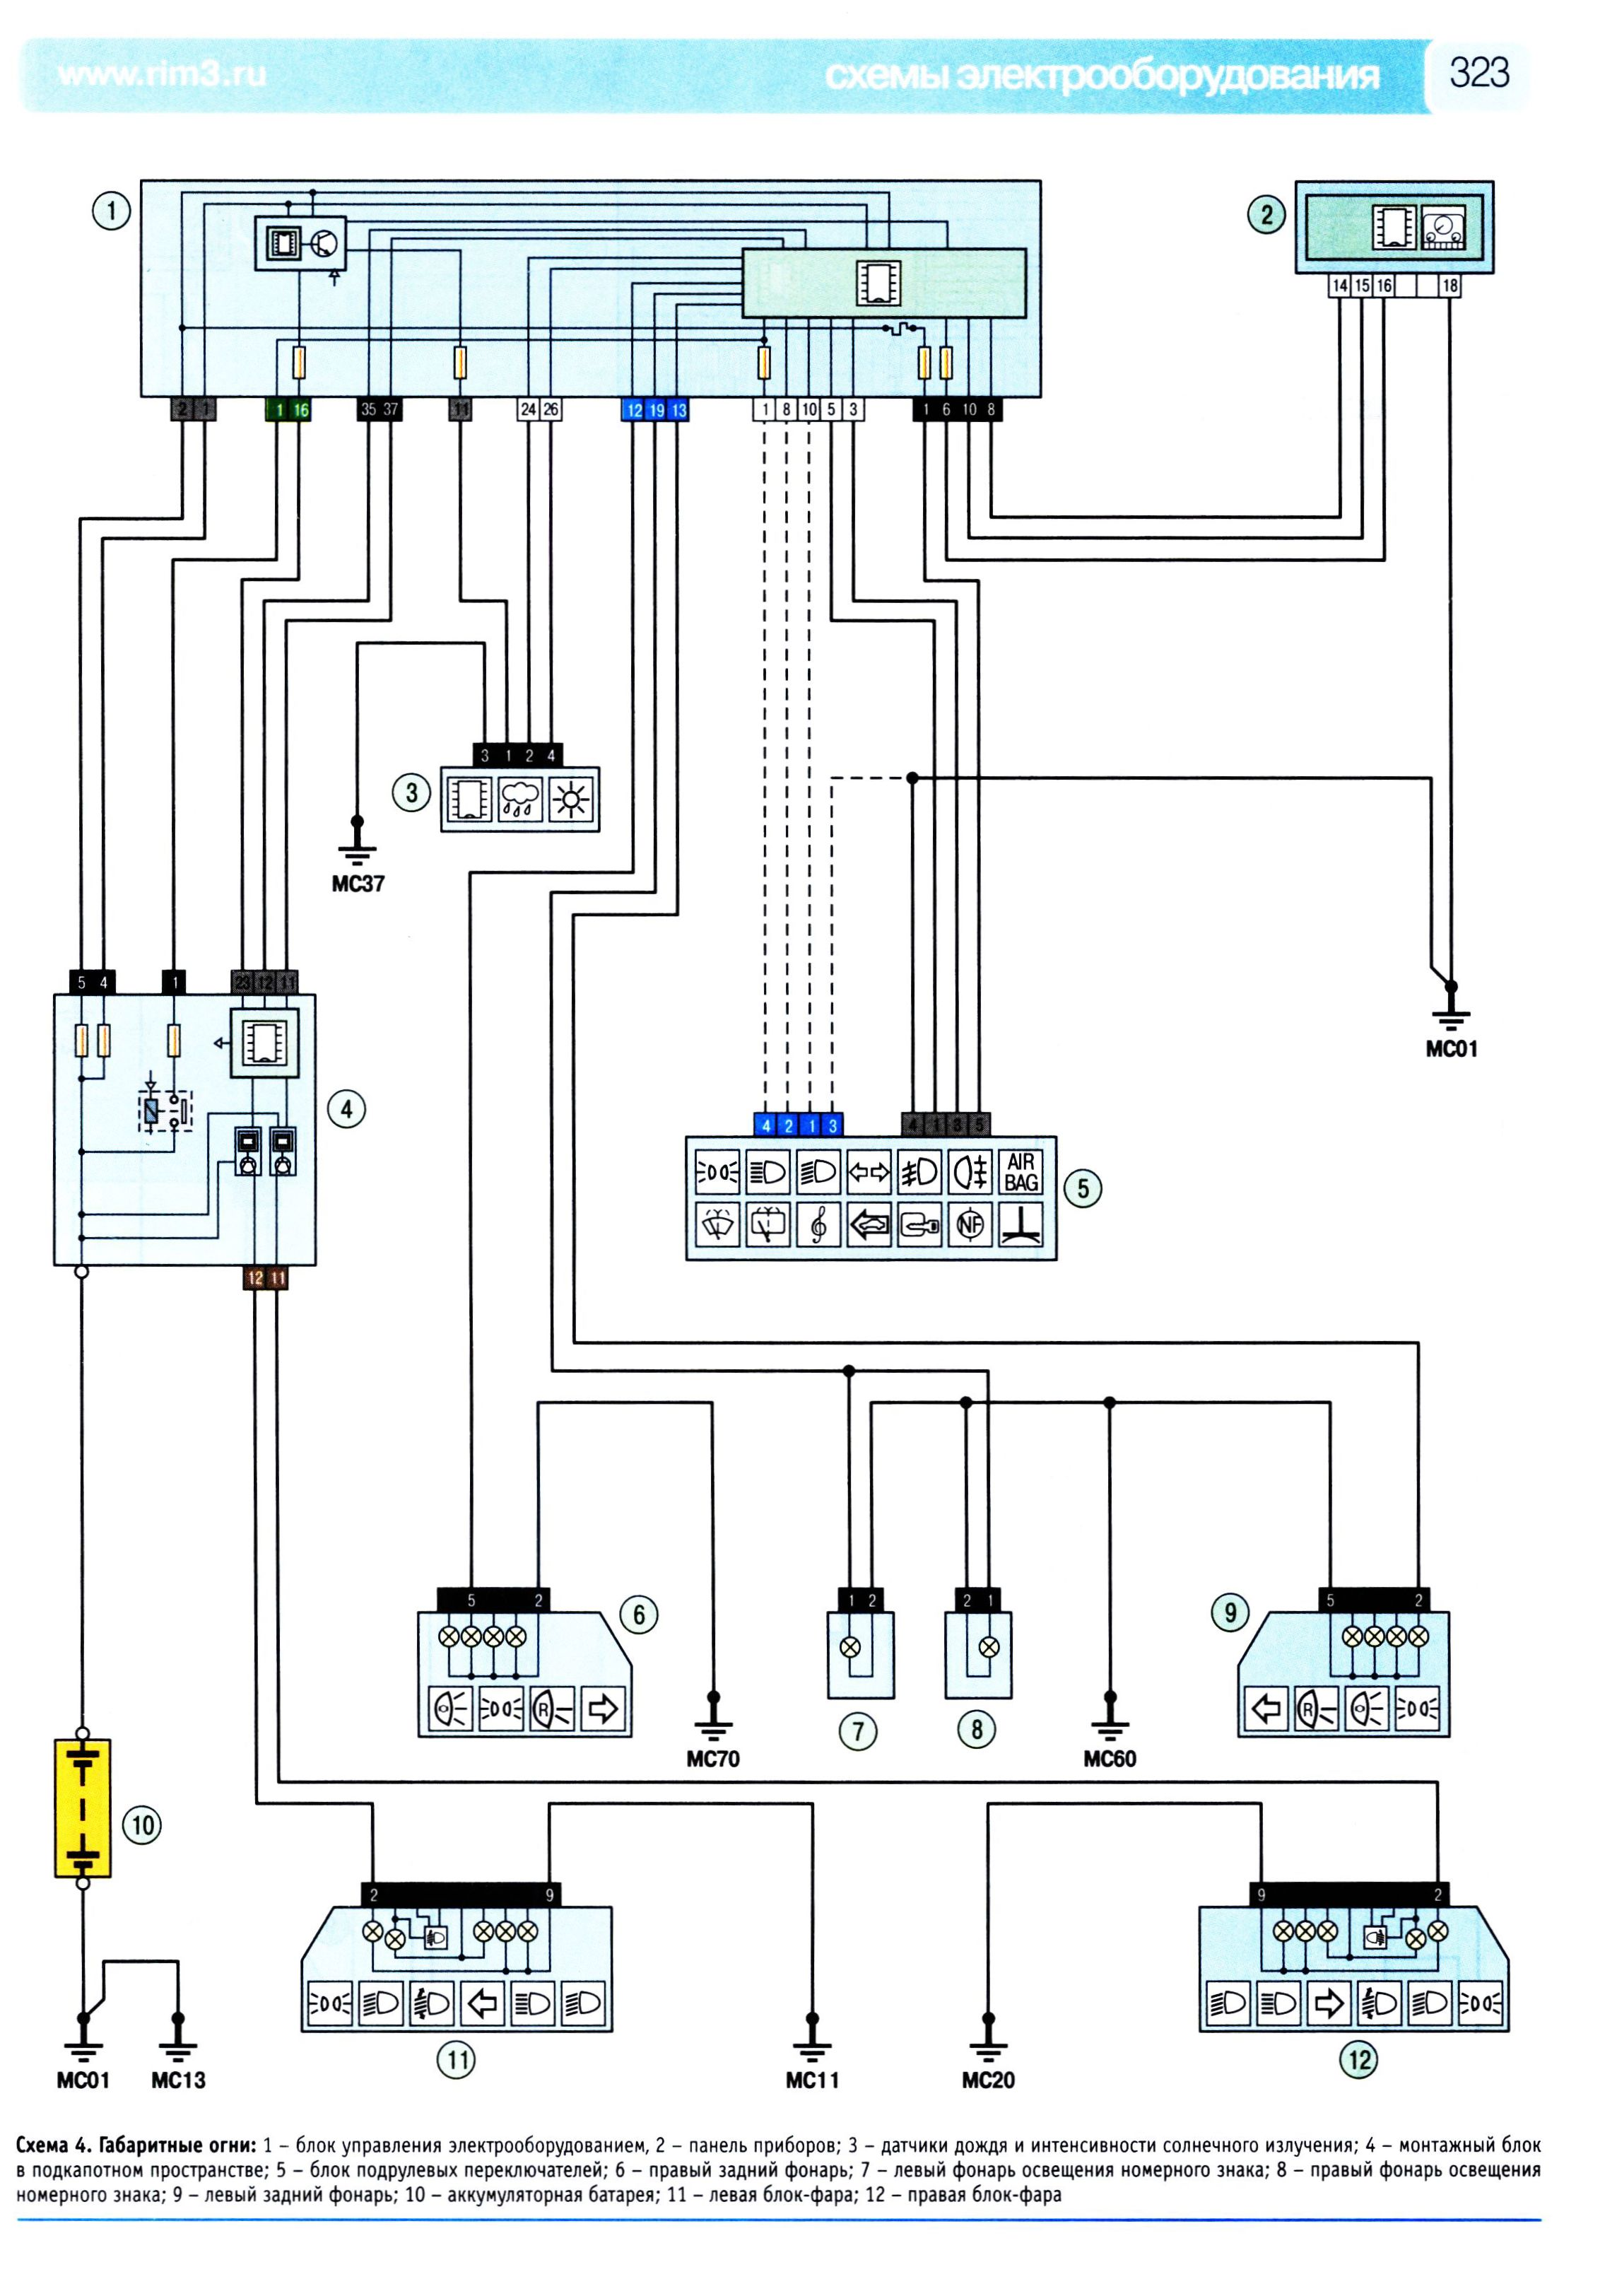 Схема подмотки спидометра газель из реле 393